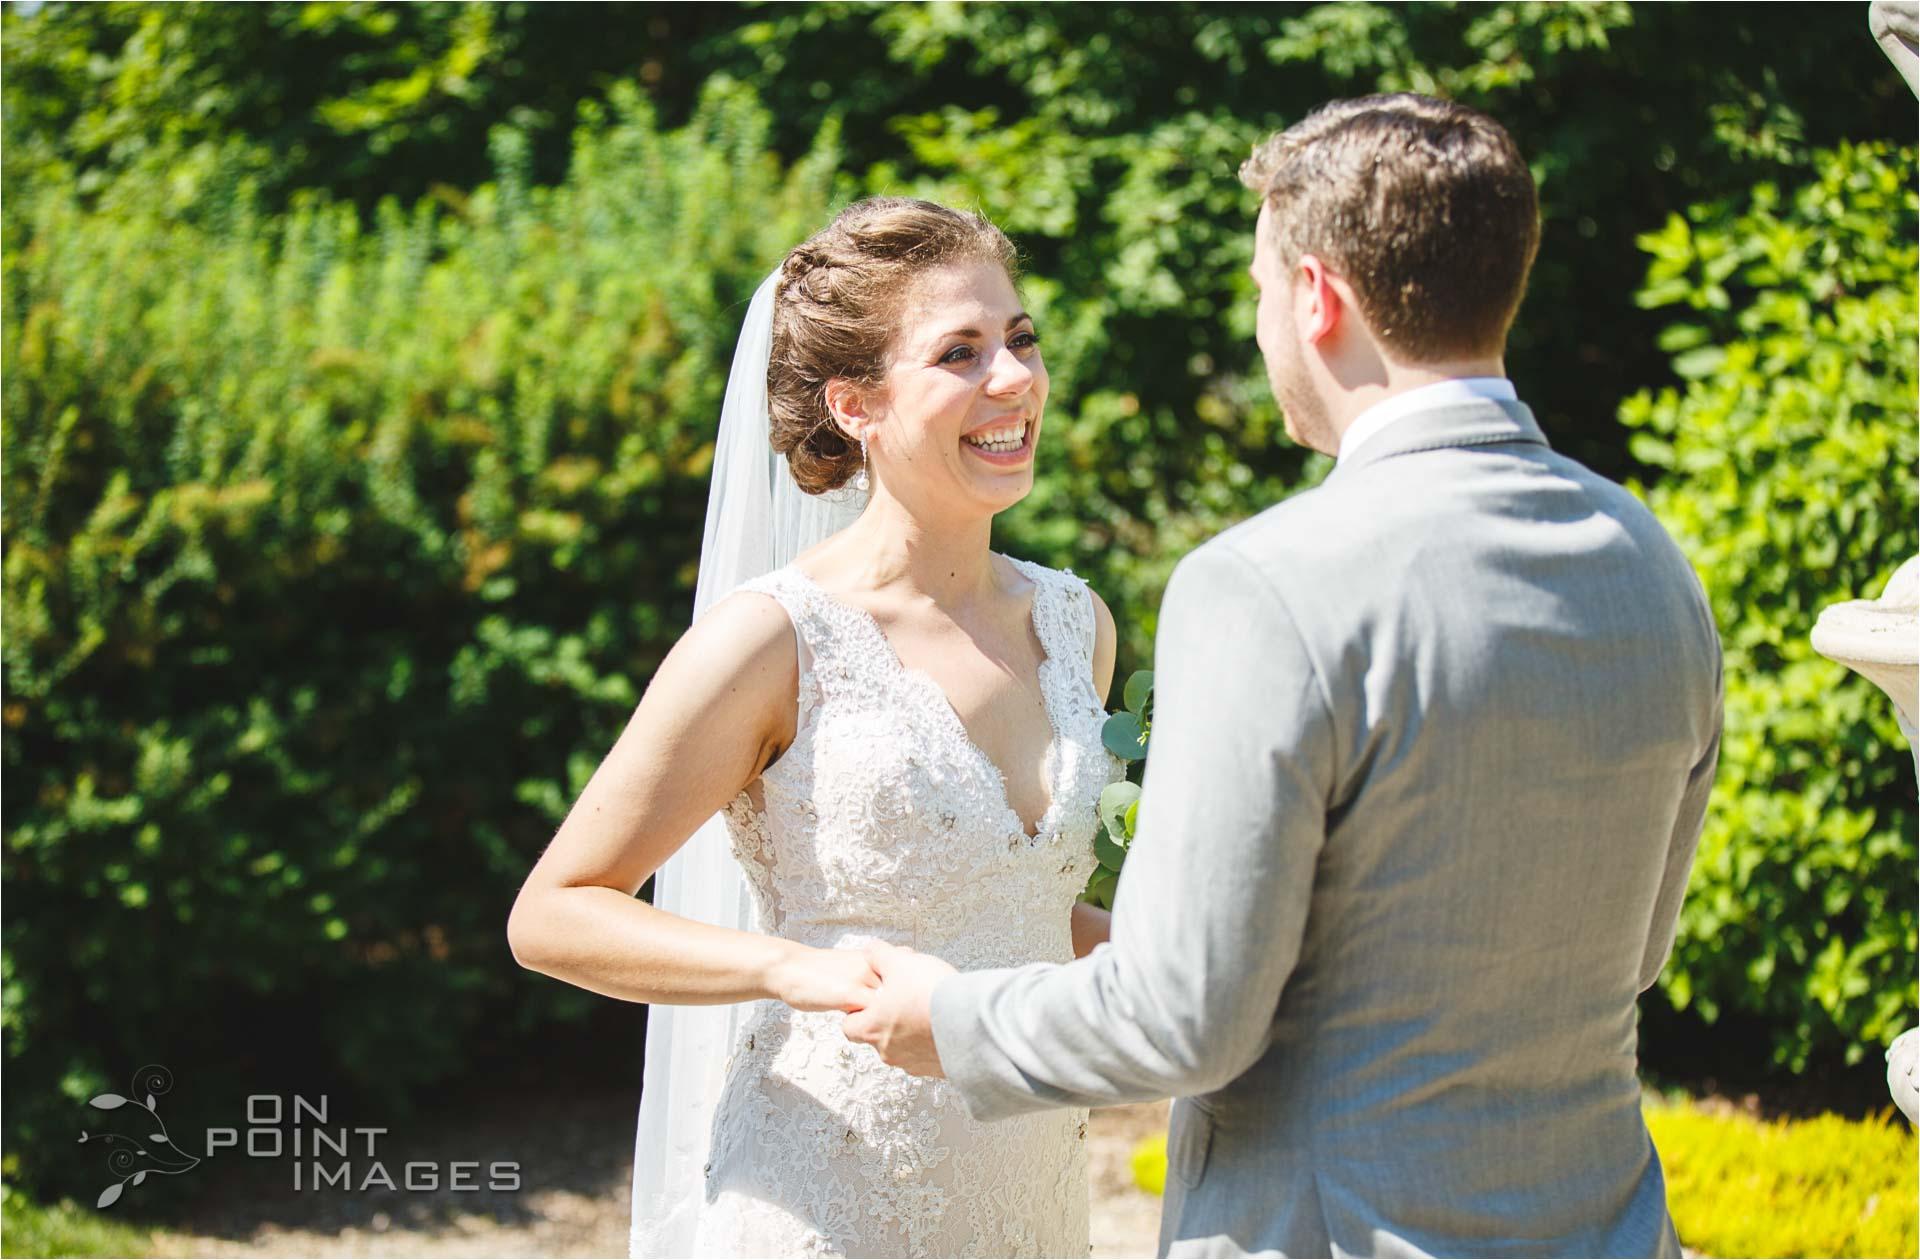 wickham-park-wedding-photographer-ct-11.jpg